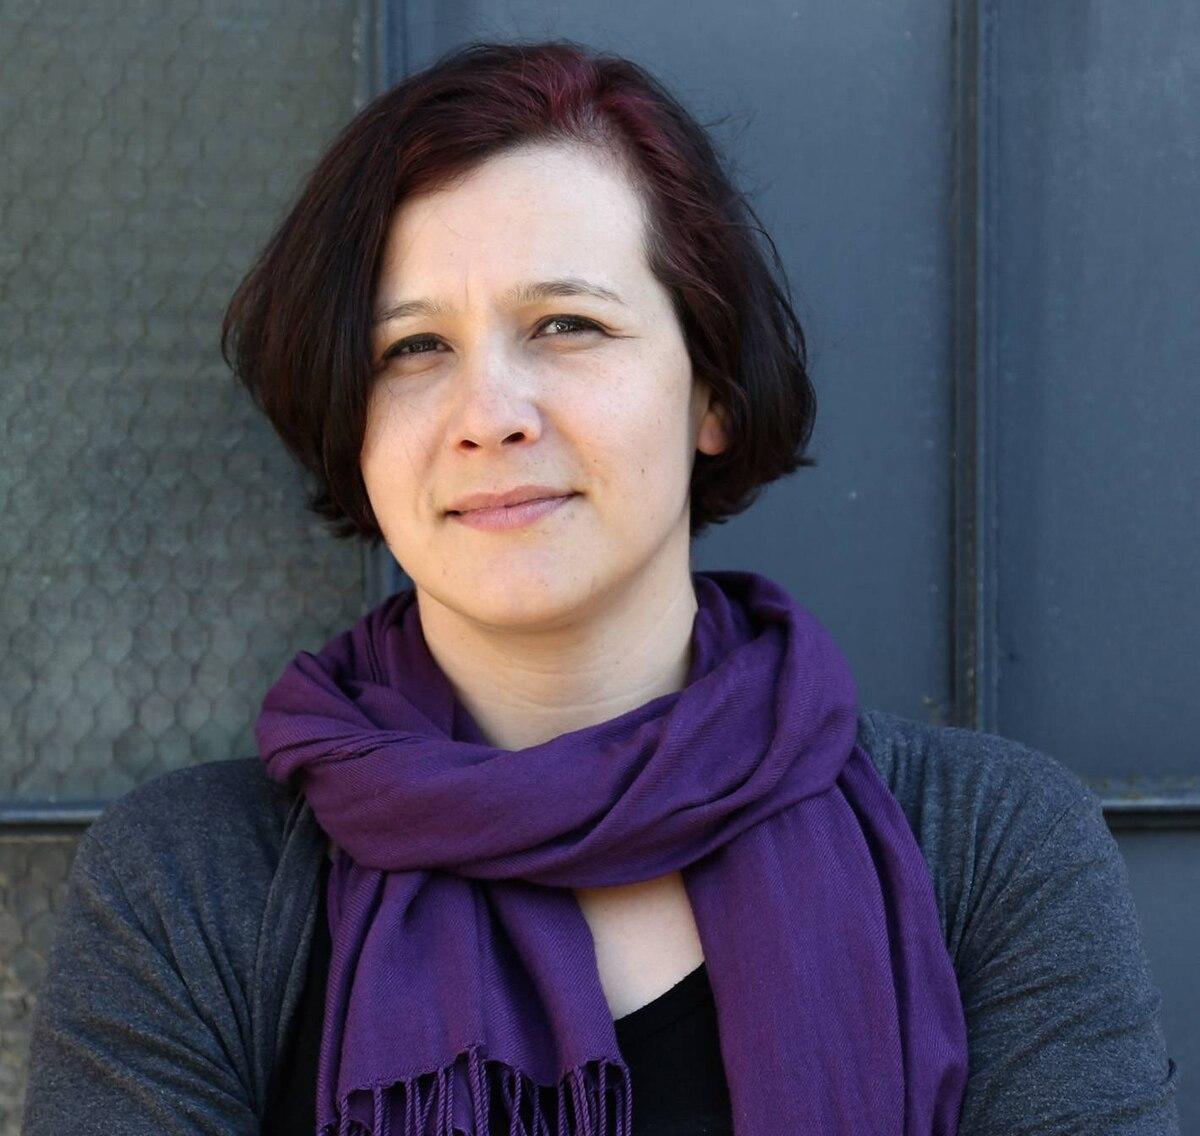 Lisa Delorme Meiler